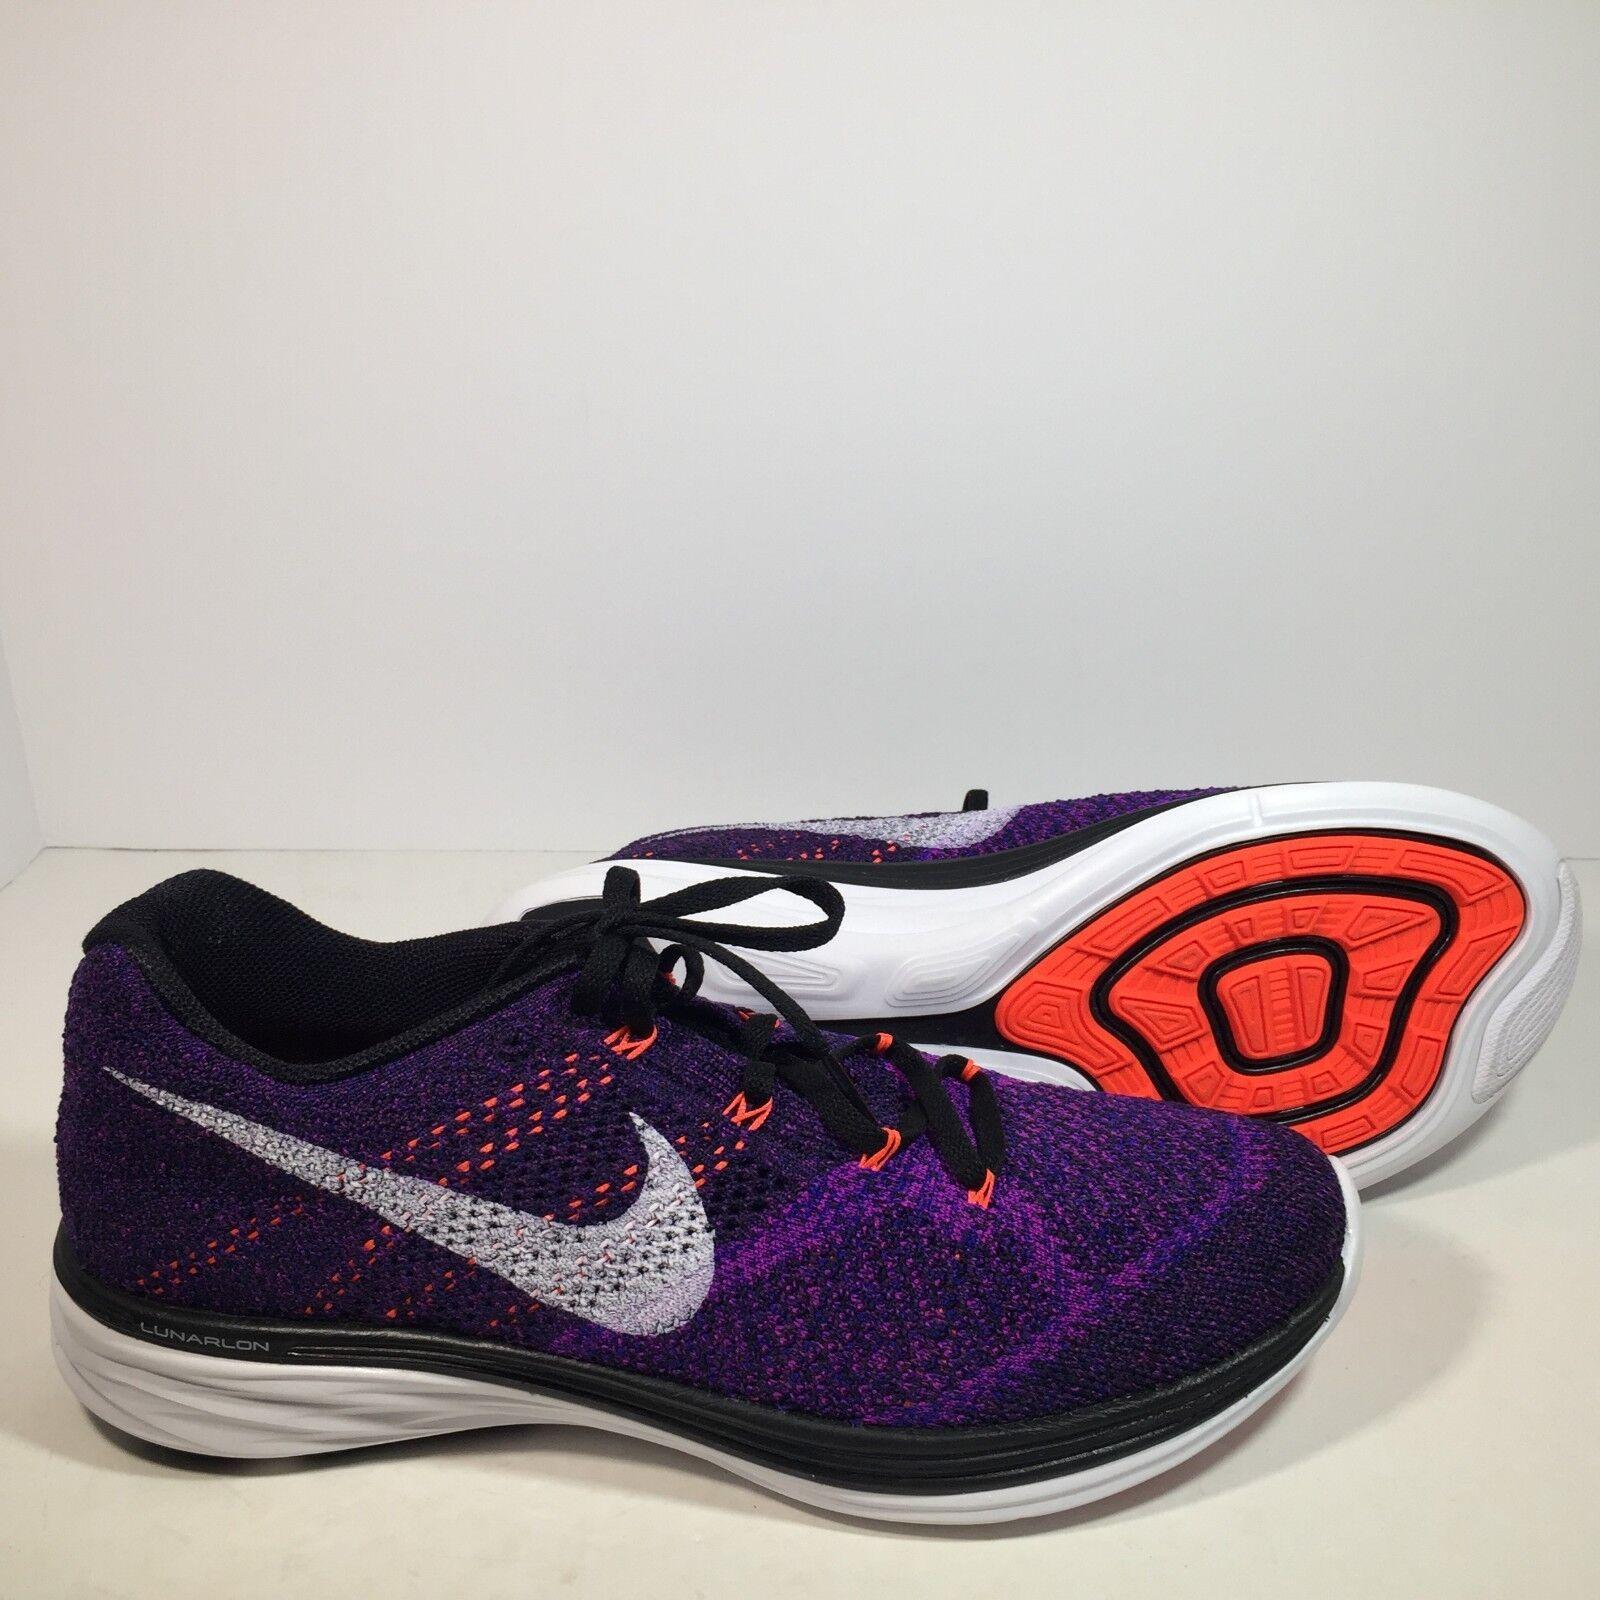 Nike Flyknit Lunar3 Men's Running Shoes 698181-014 Size 10, 10.5